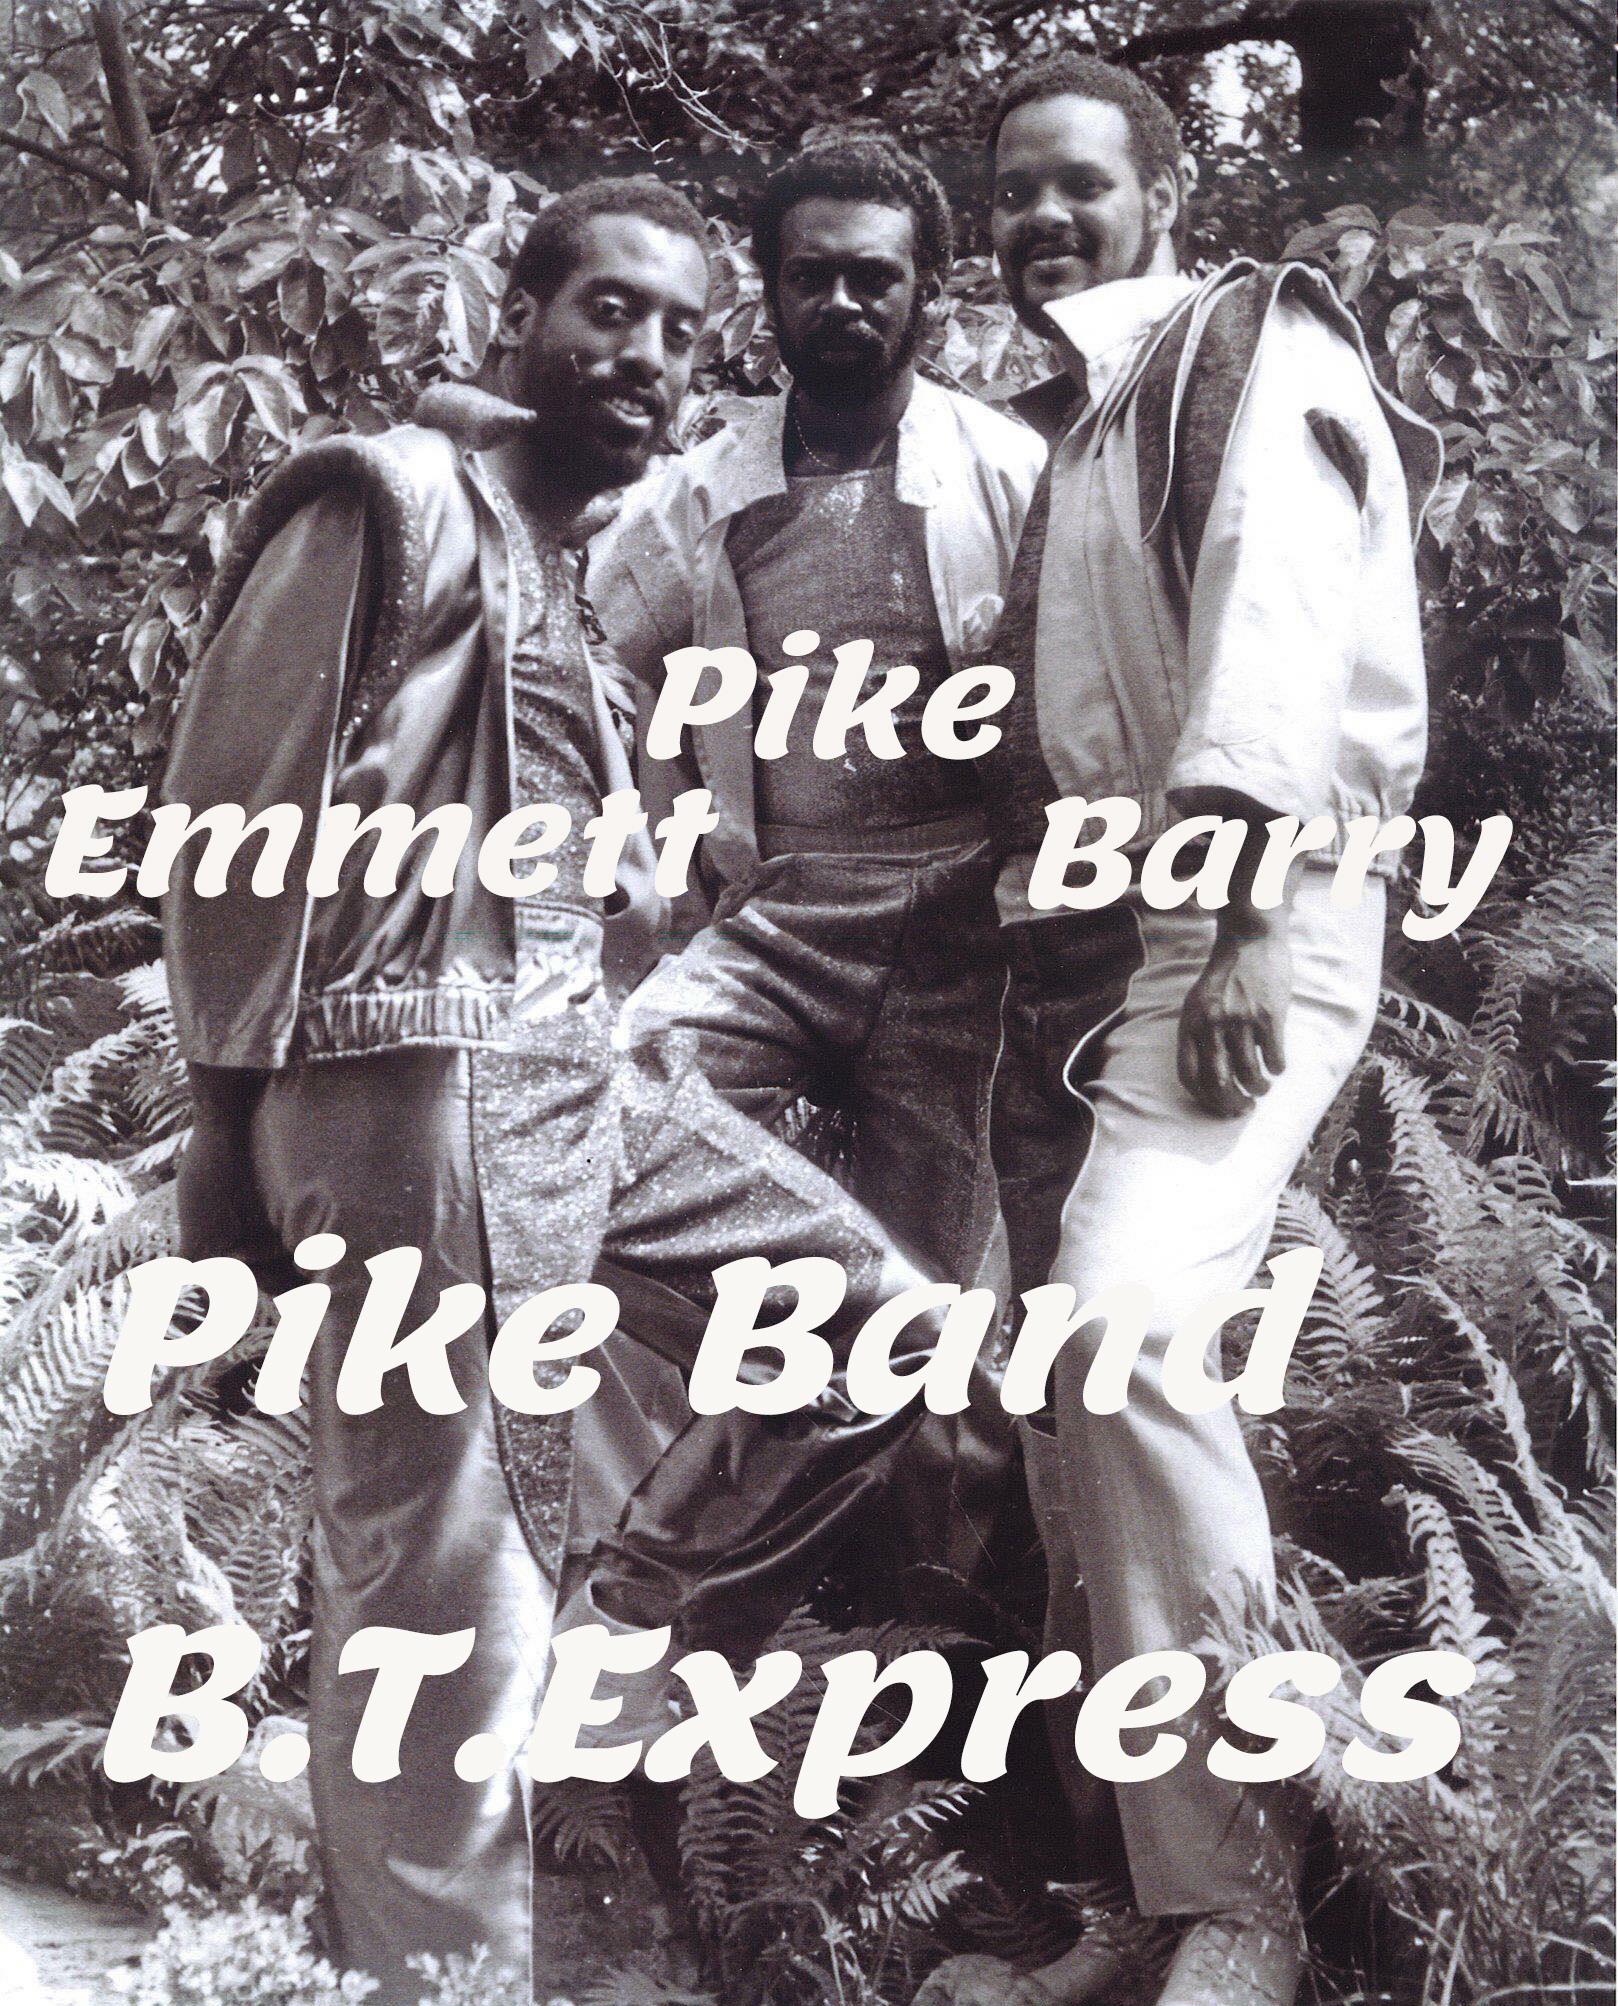 PIKE Band メンバ- 02